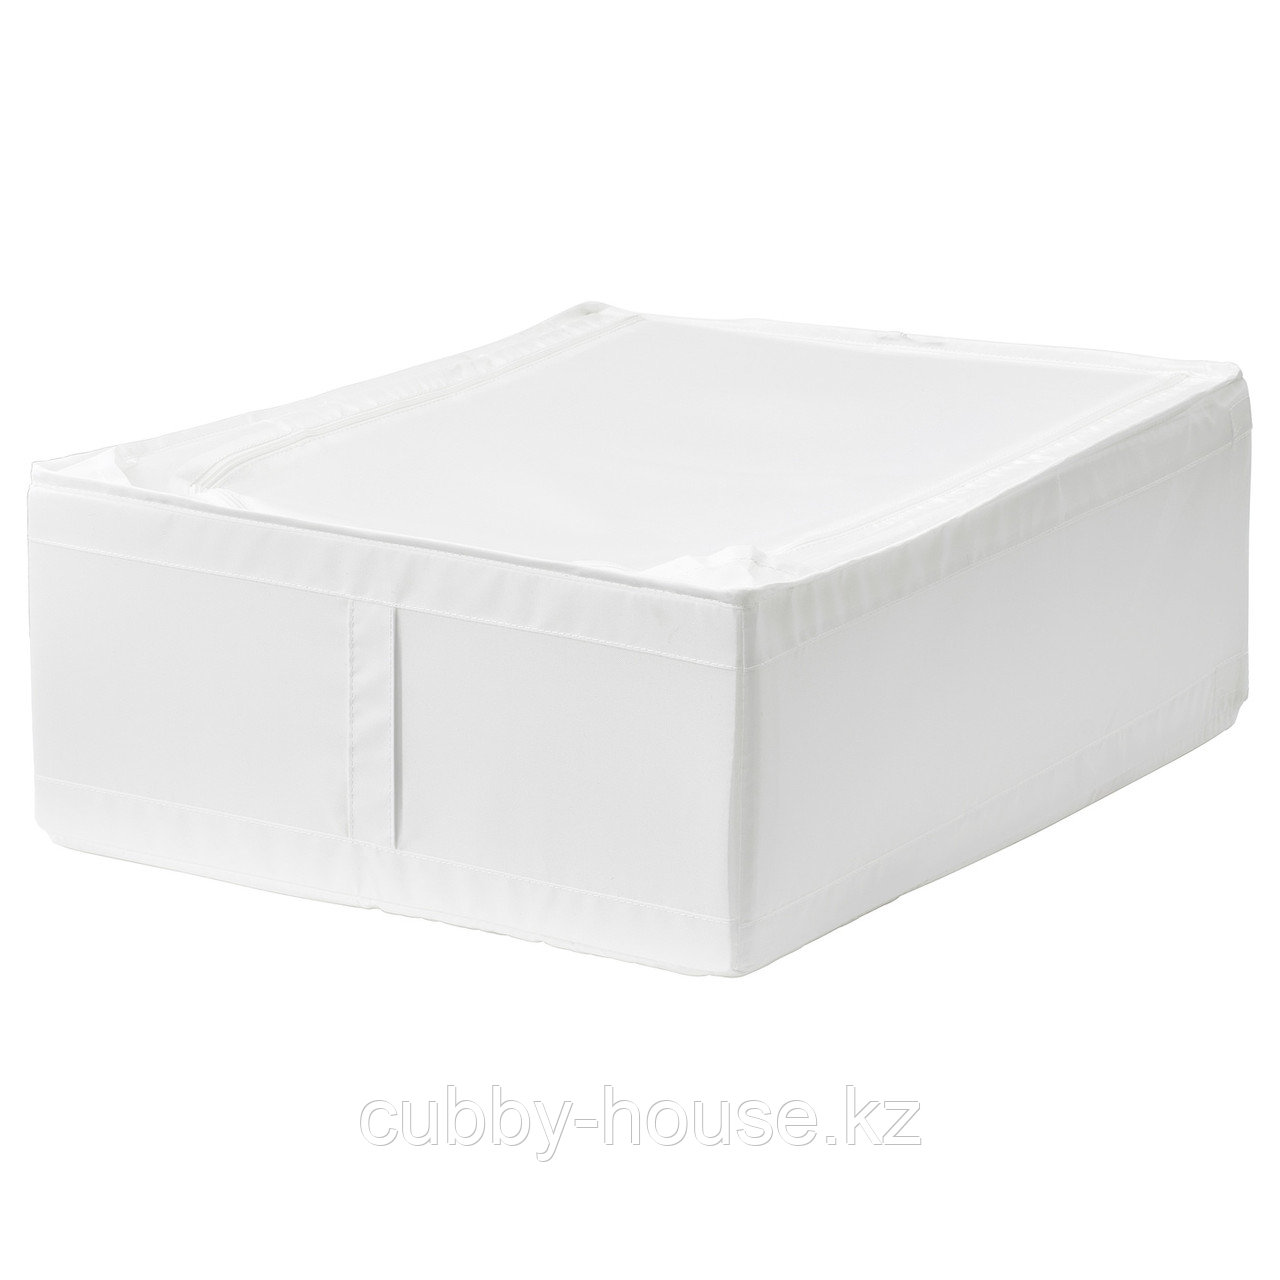 СКУББ Сумка для хранения, белый, 44x55x19 см